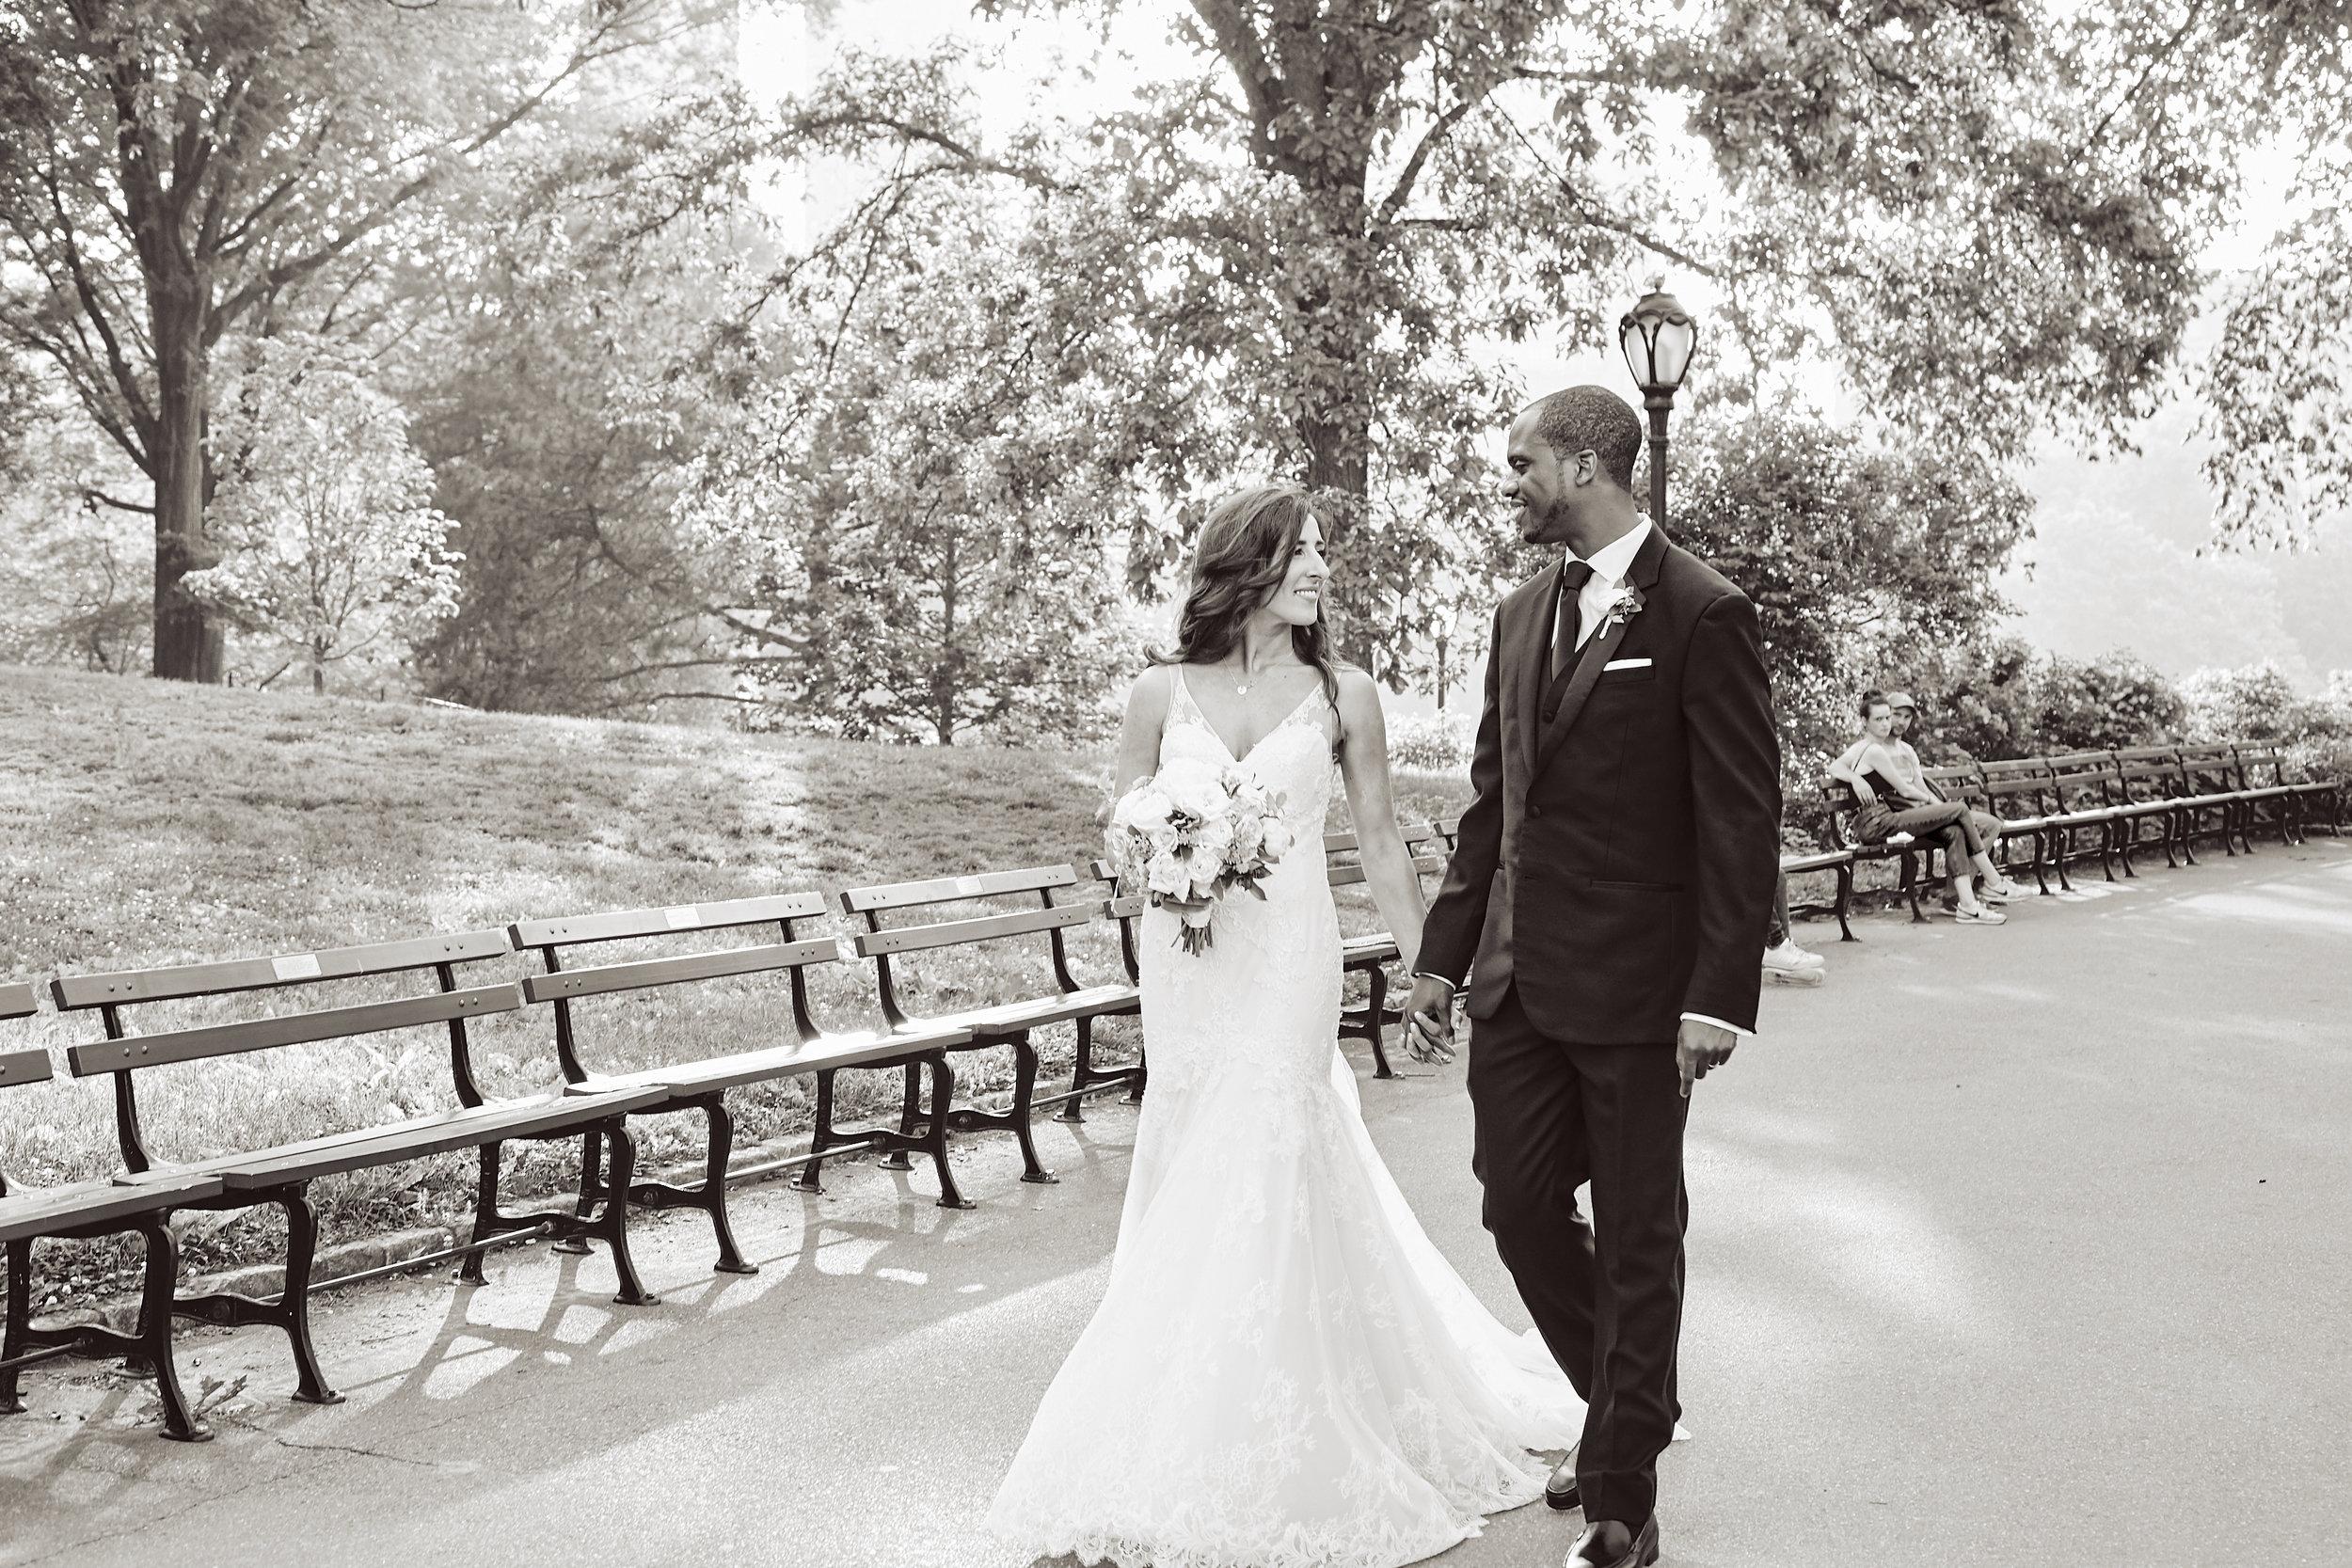 180601_AnnaAdom_CP_Wedding_ 261.jpg